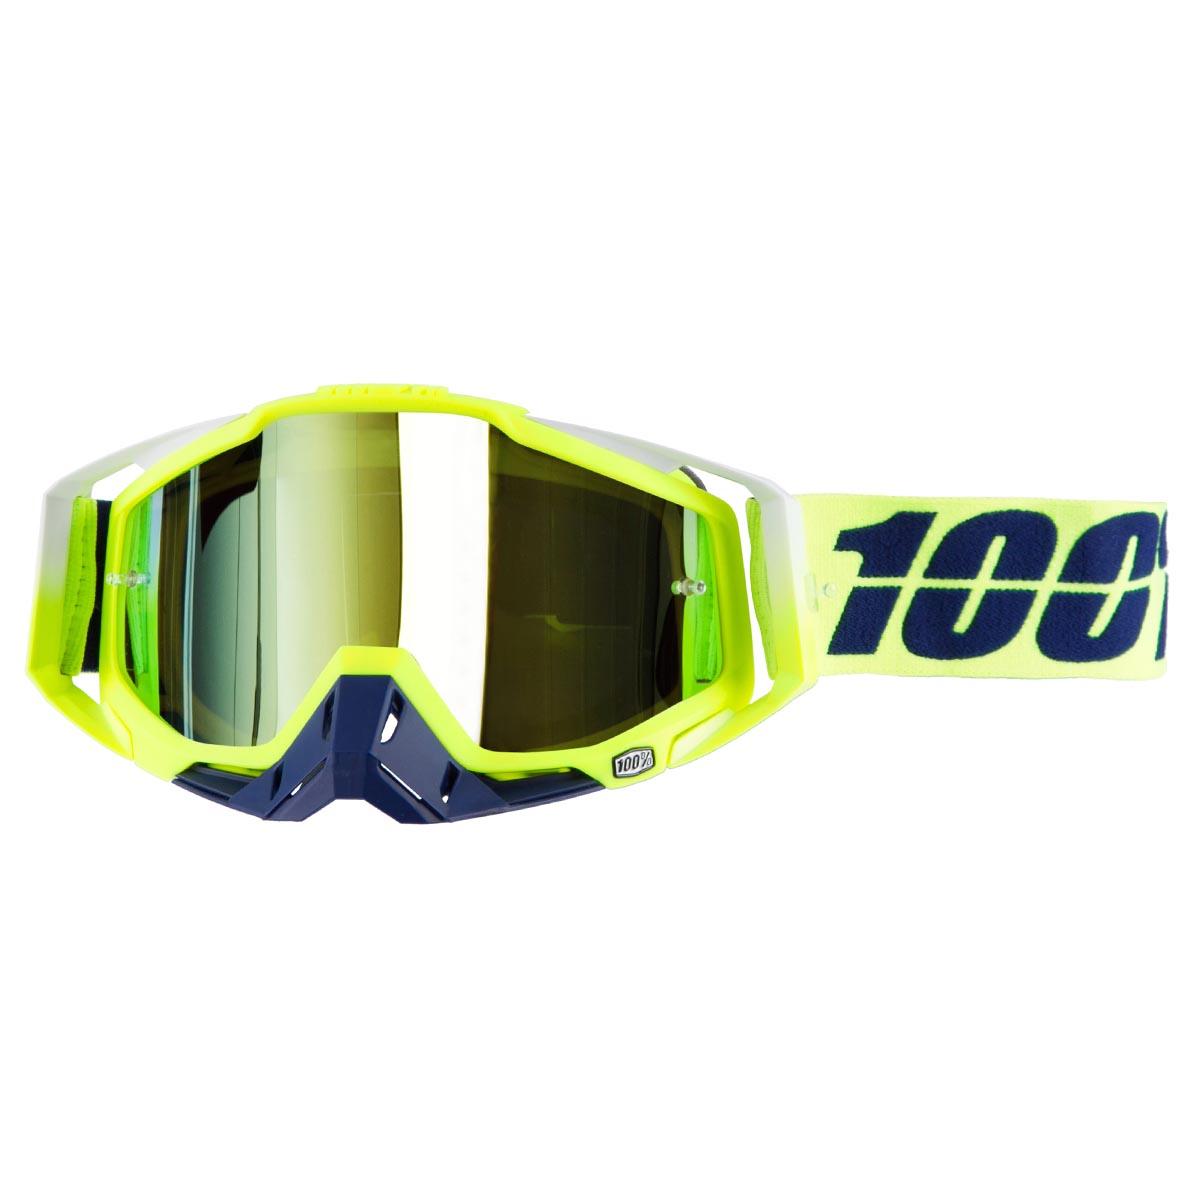 100% Crossbrille The Racecraft Tanaka - Gold verspiegelt Anti-Fog